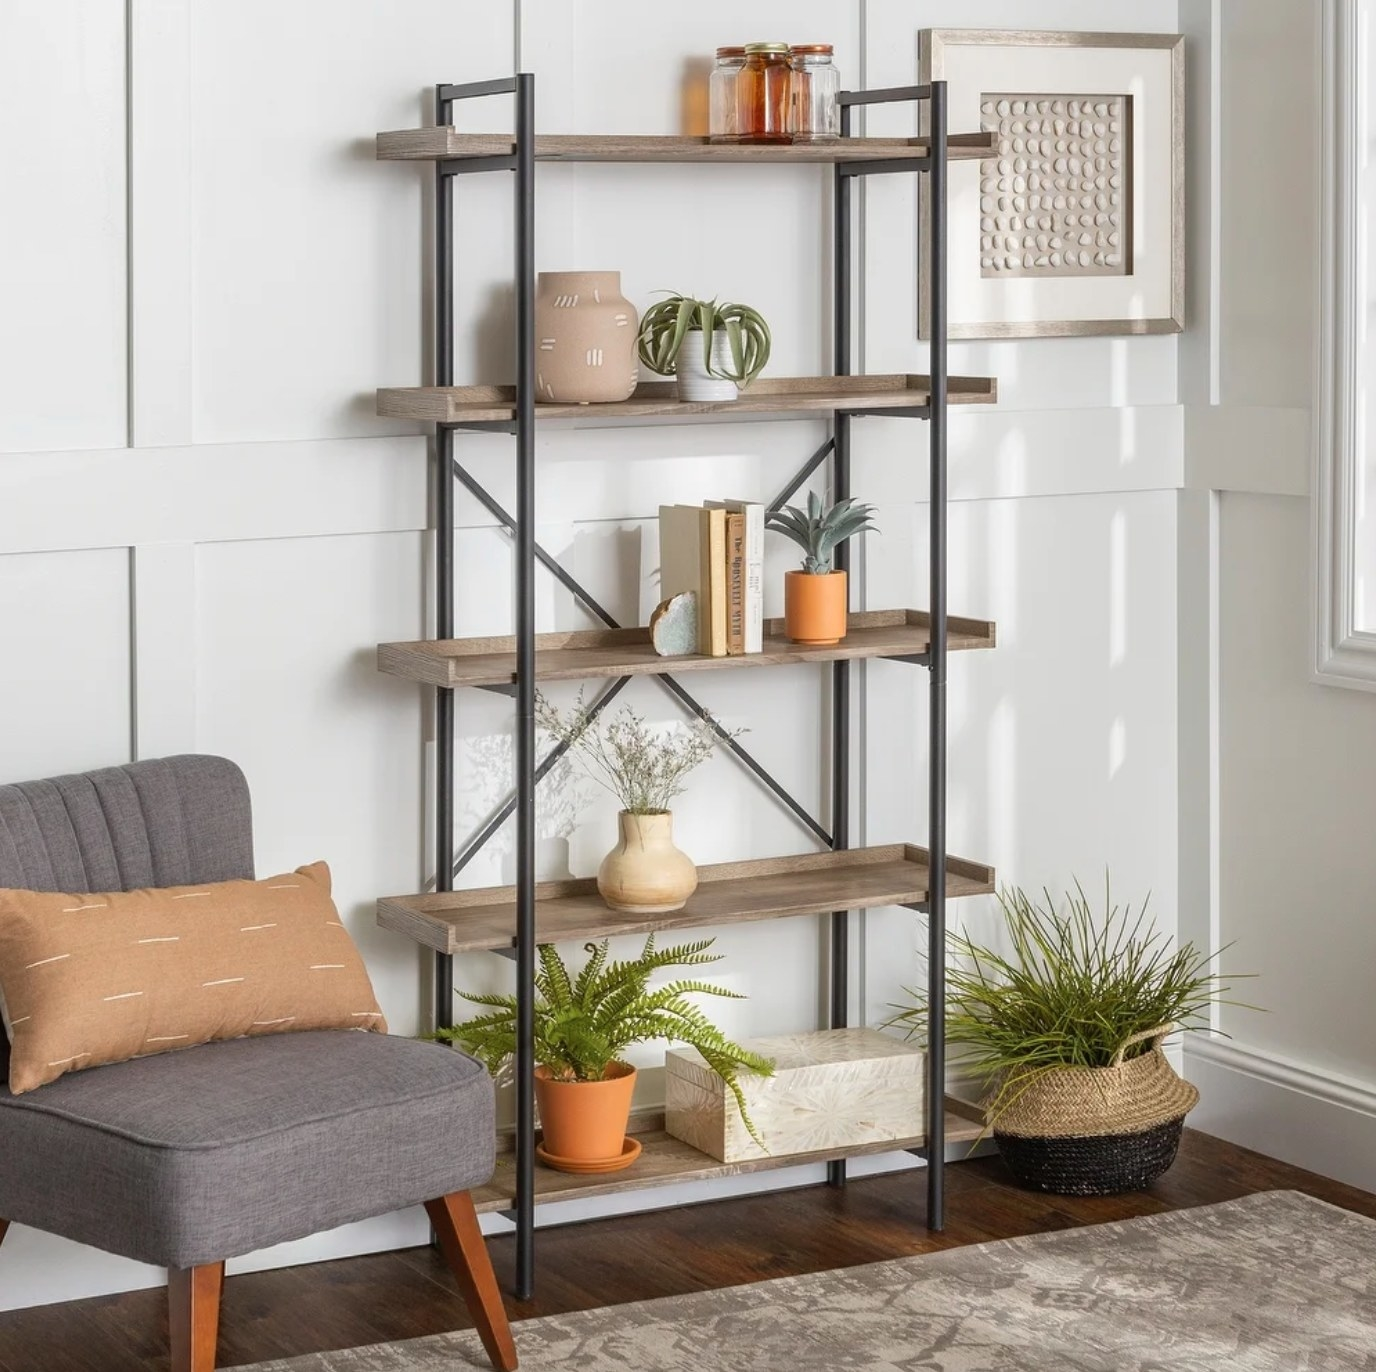 The rustic bookshelf in grey wash